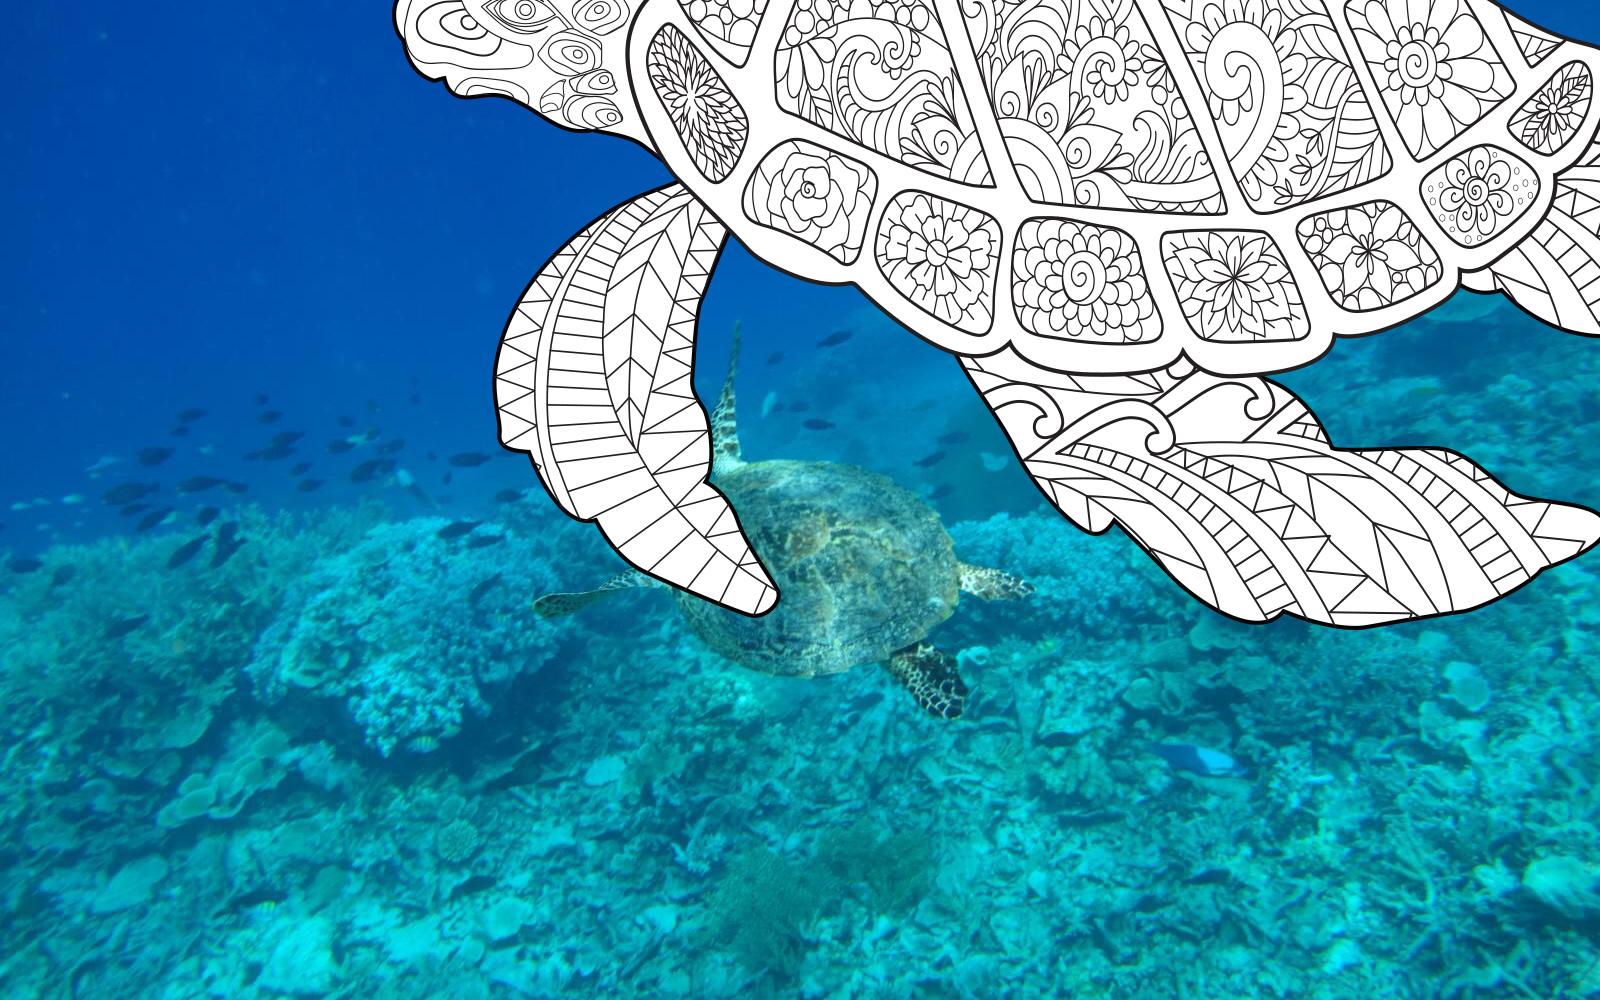 Zentangle doodle art image of turtle, Bawah Reserve, Indonesia